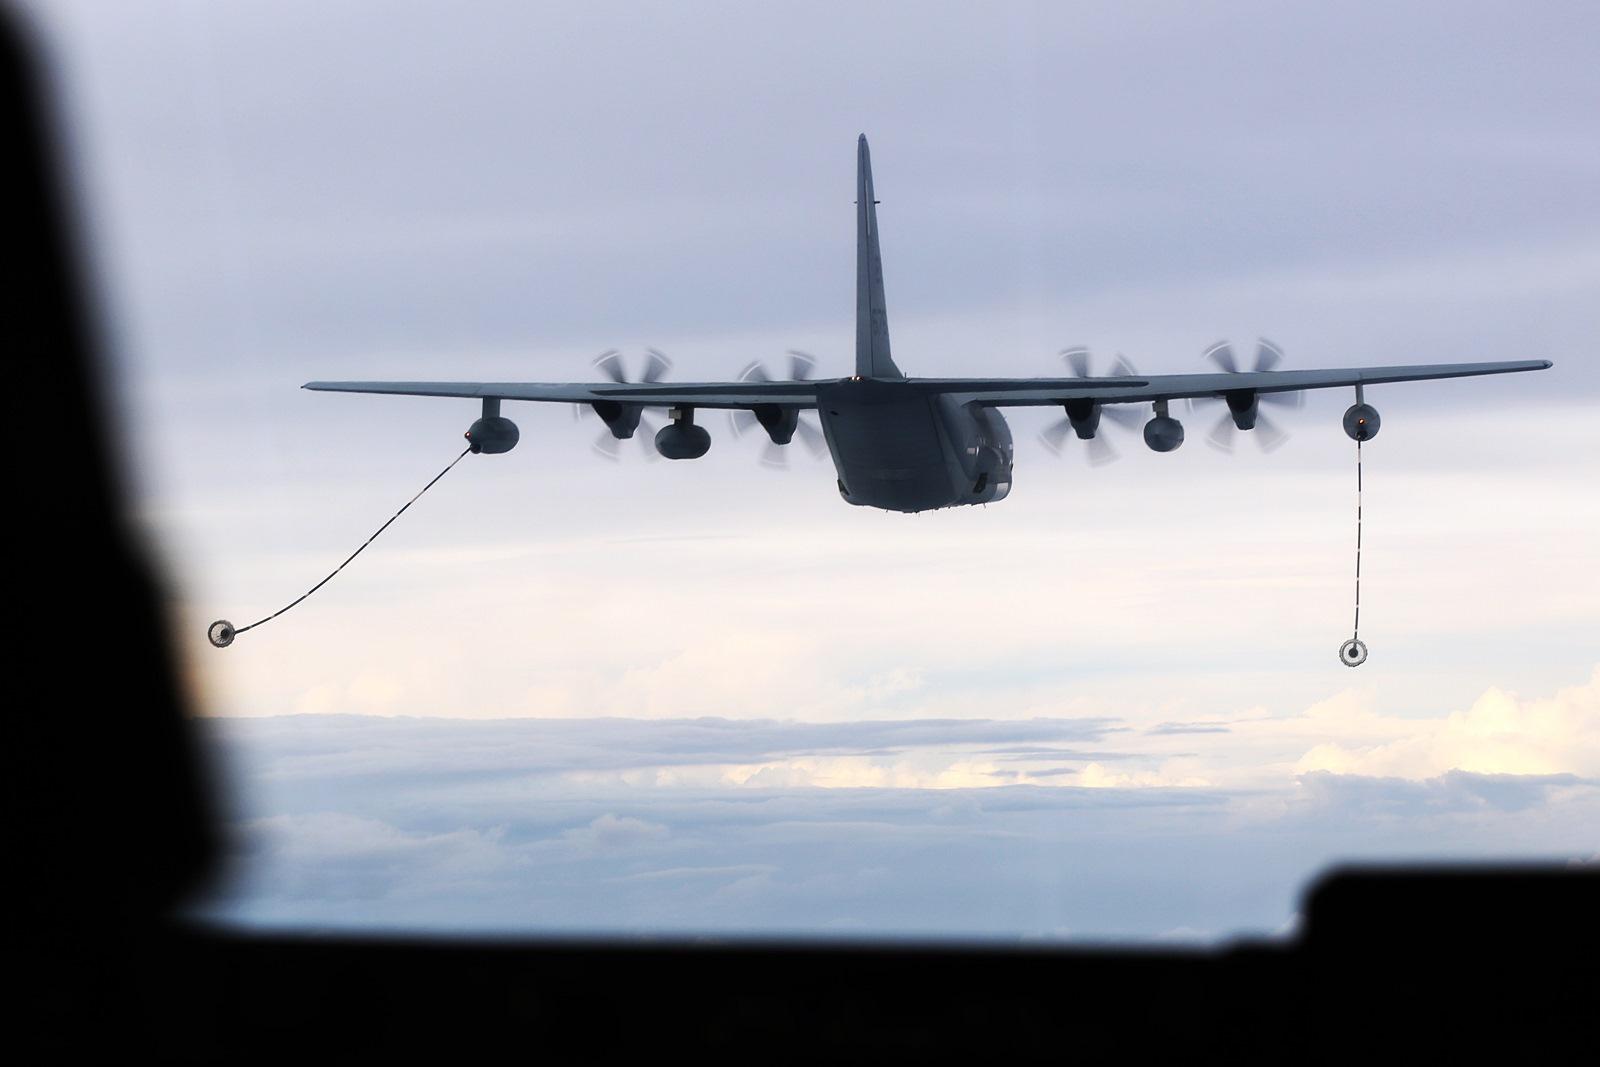 KC-130J로부터 공중급유받는 미 해병대 MV-22 Osprey